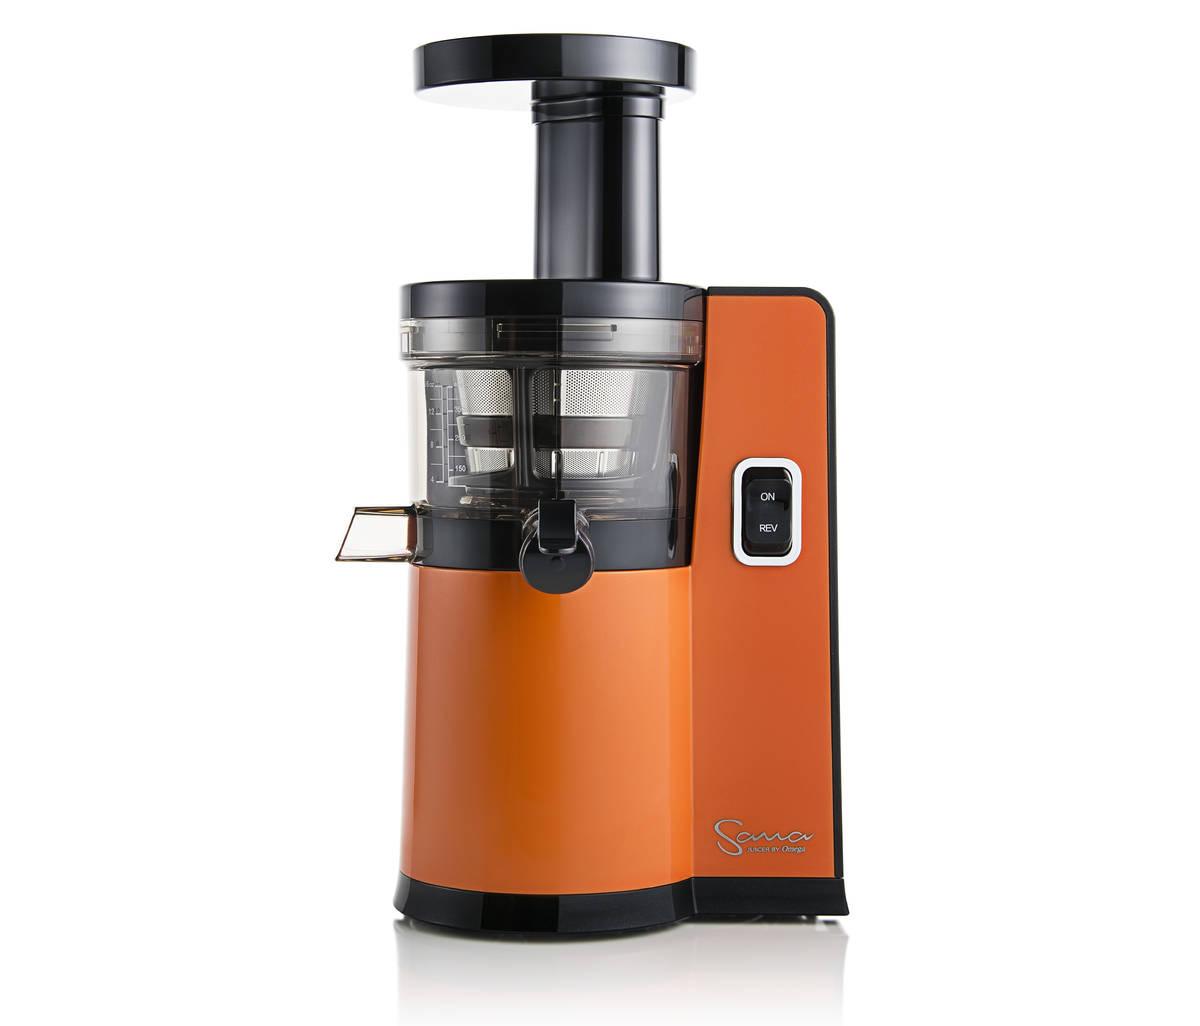 Vertikální odšťavňovač Sana EUJ-808 oranžový firmy Omega